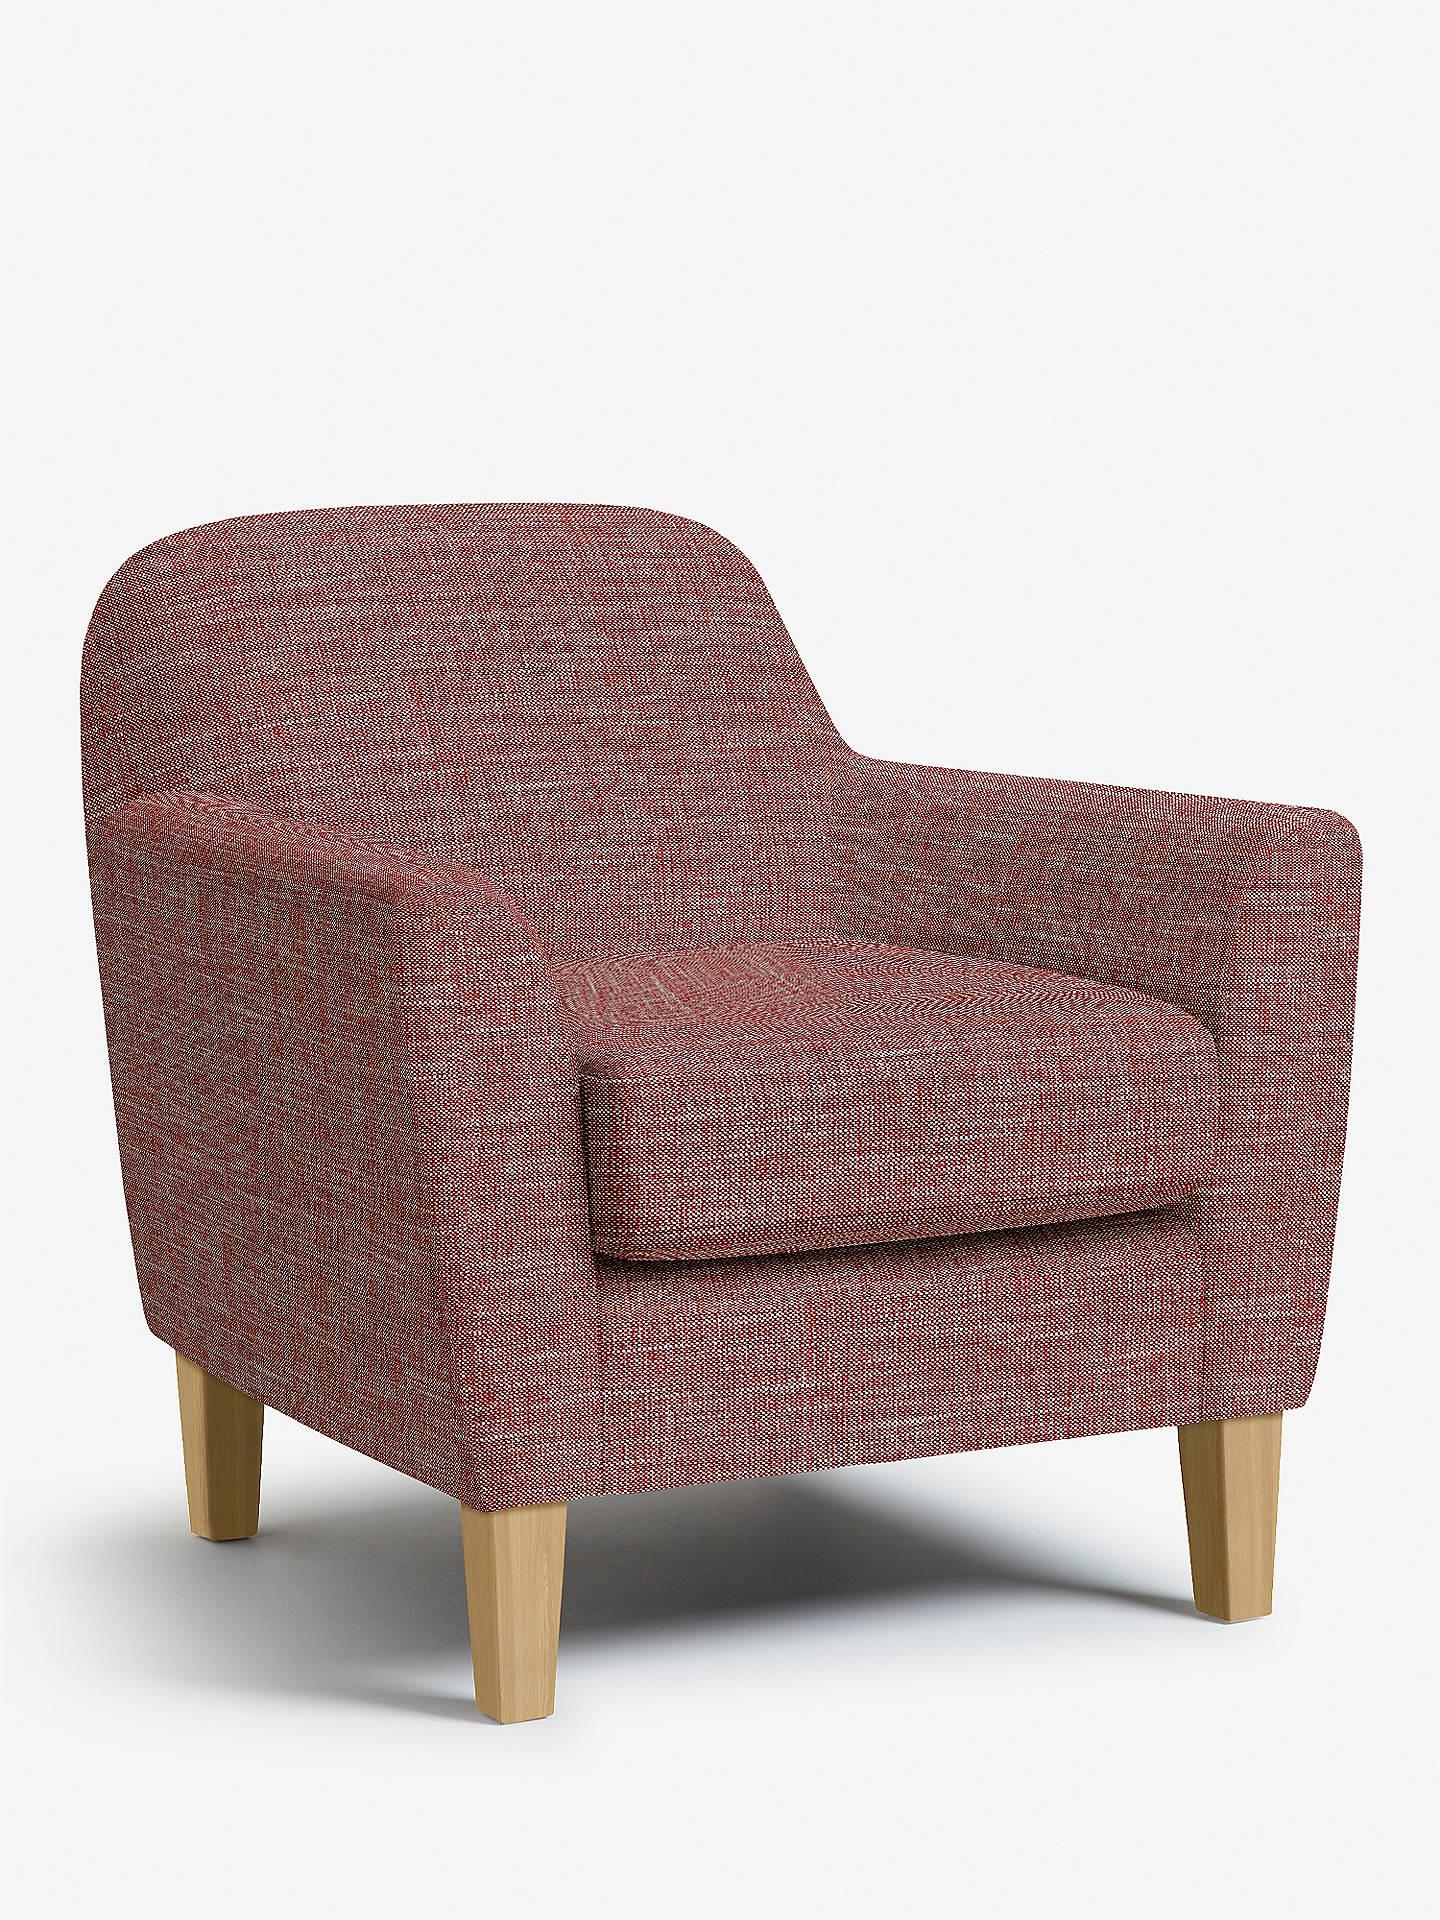 Awesome John Lewis Partners Connor Armchair Light Leg Hope Burnt Orange Alphanode Cool Chair Designs And Ideas Alphanodeonline